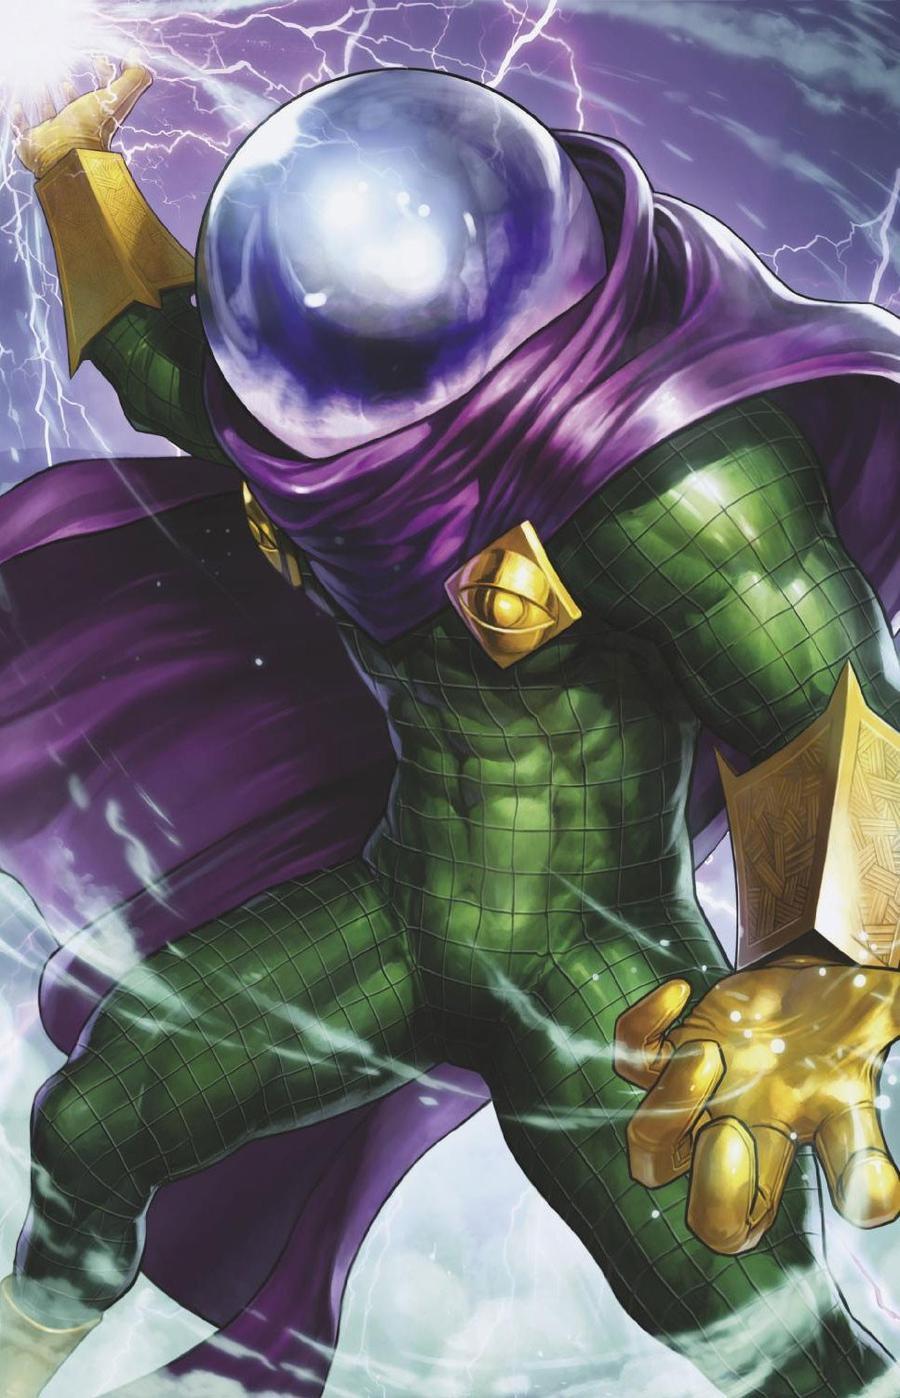 Miles Morales Spider-Man #6 Battle Lines